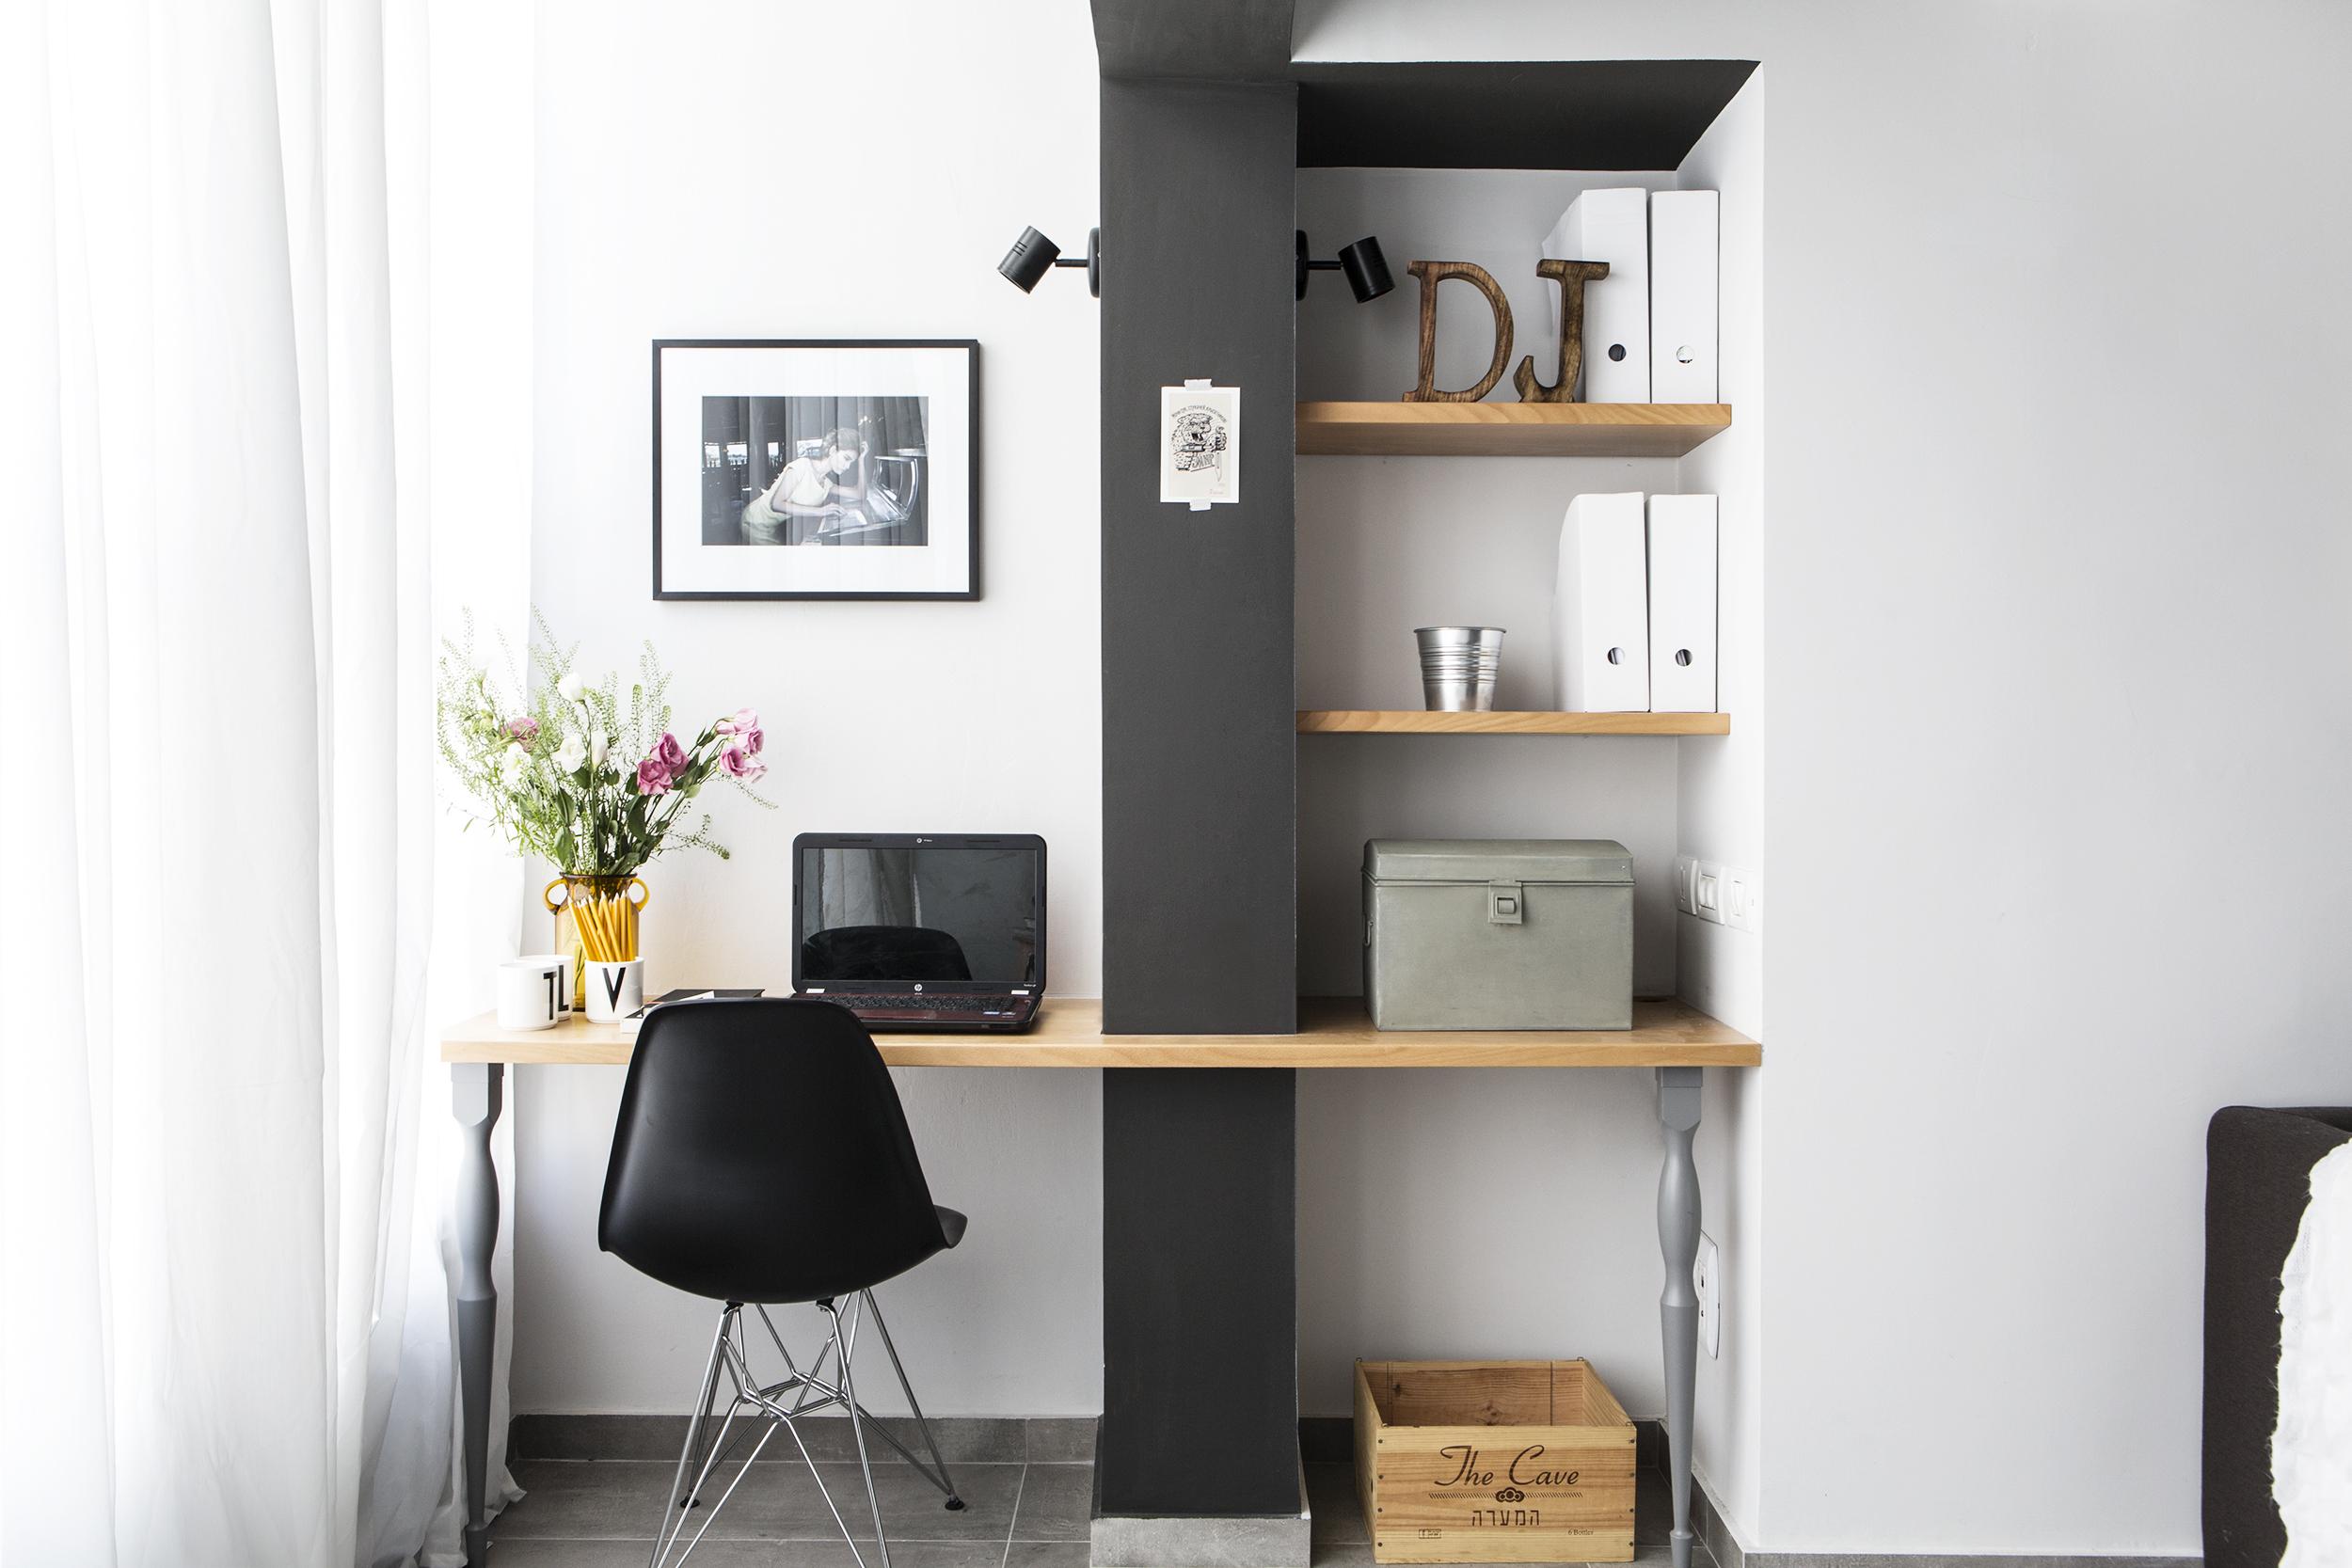 Studio TA by Vered Bonfiglioli